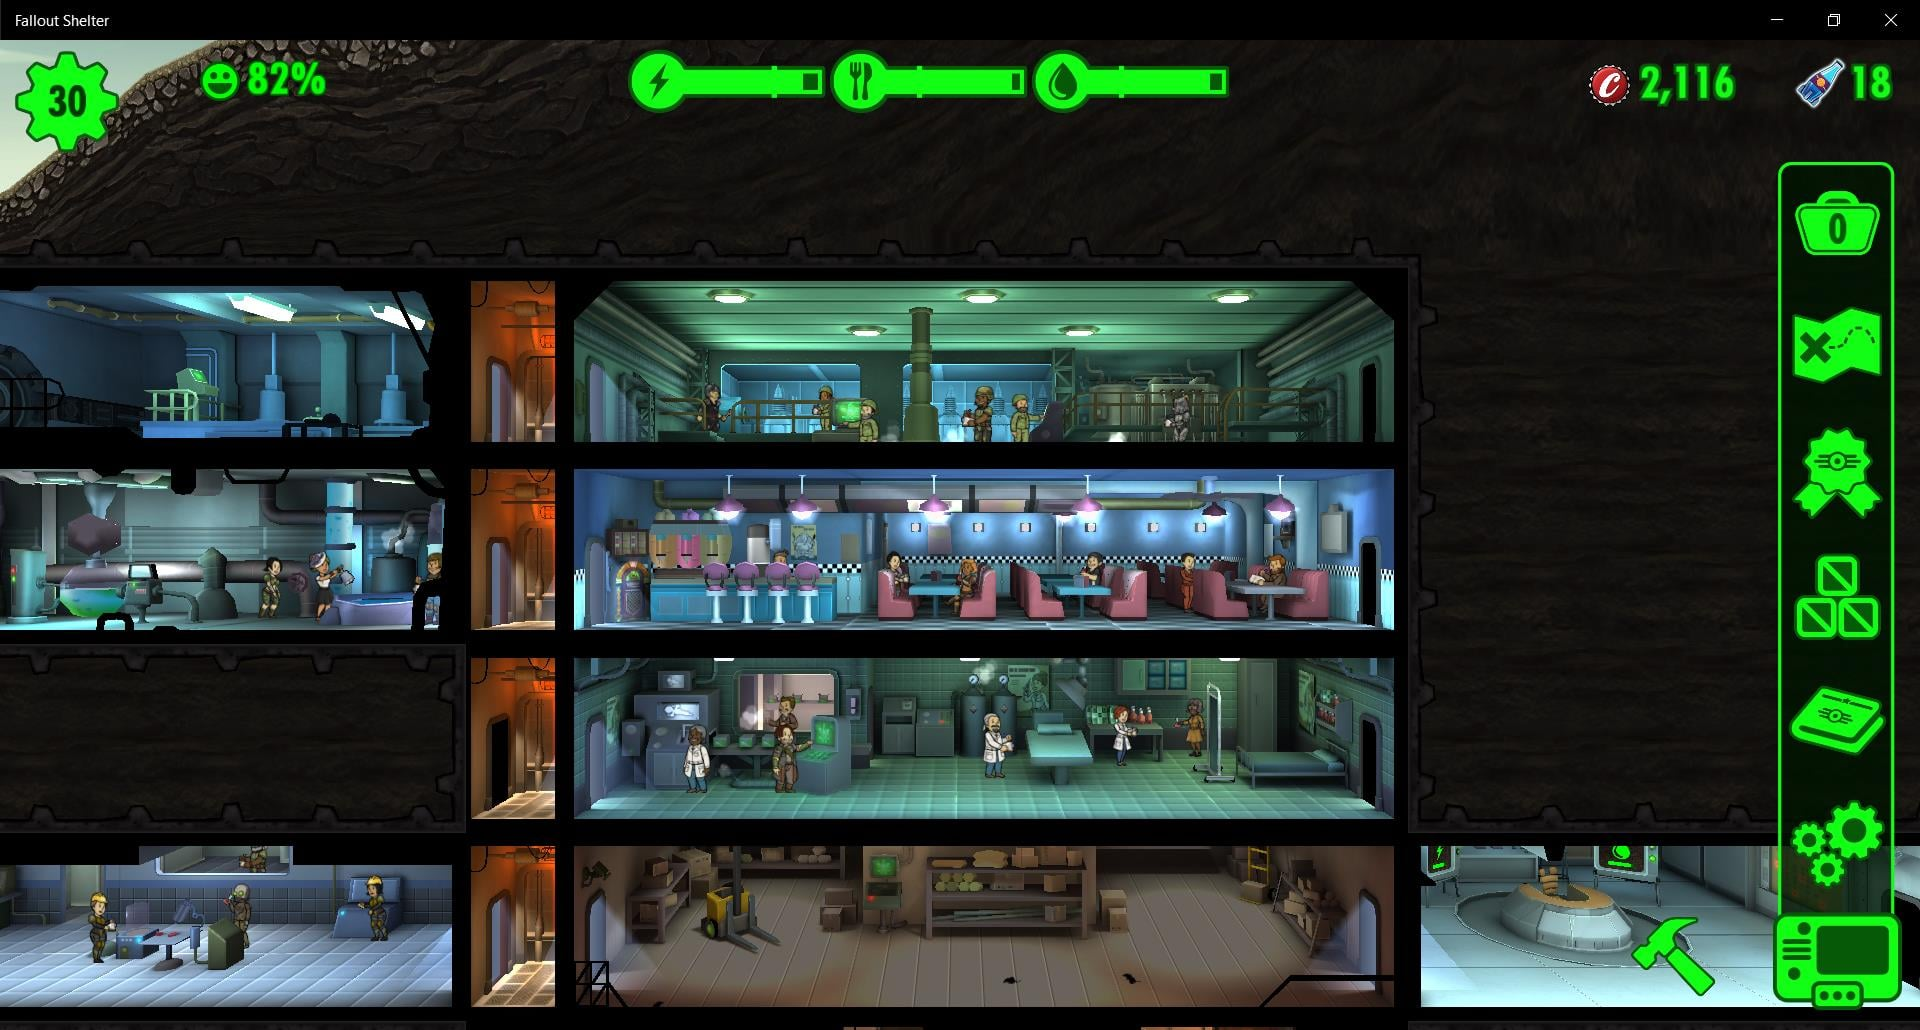 Fallout Shelter Walkthrough - Page 2